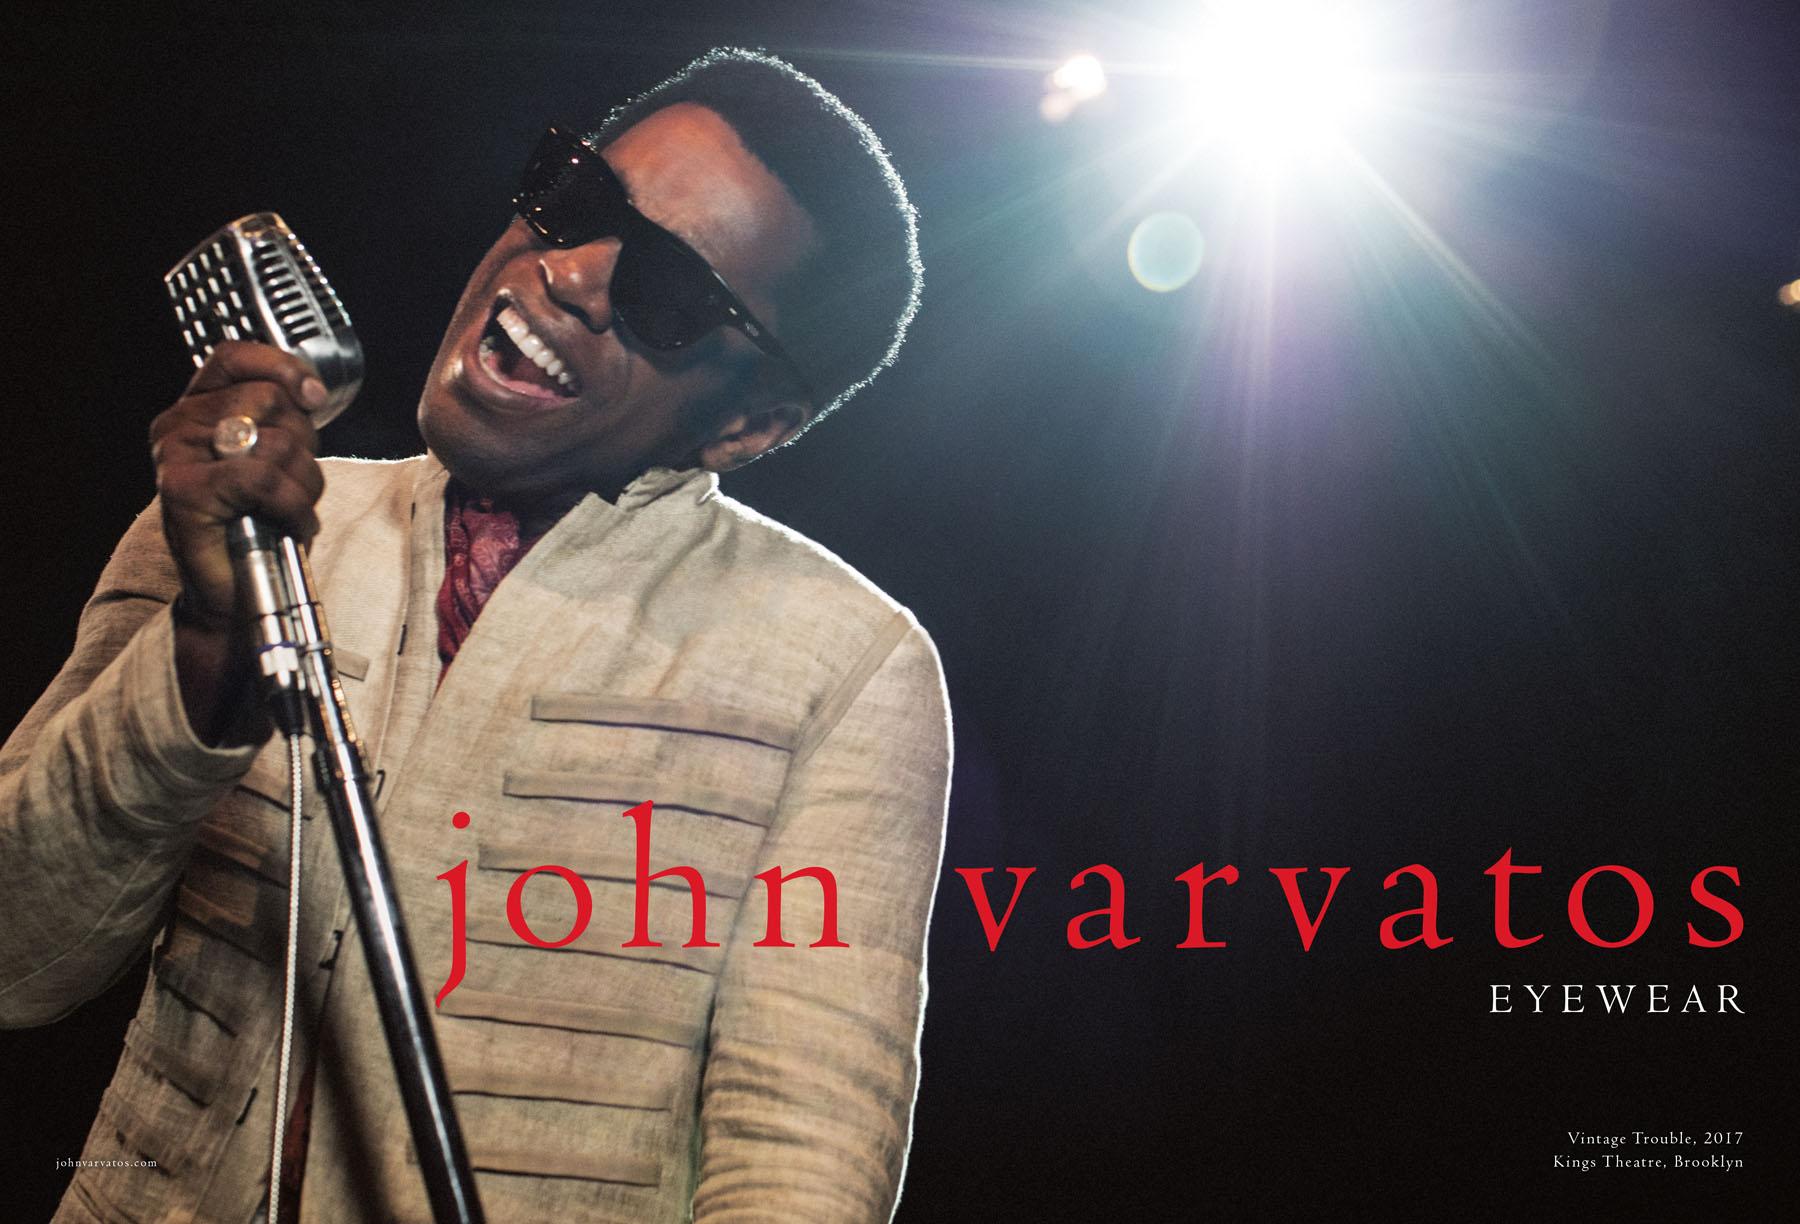 John-Varvatos-spring-2017-ad-campaign-the-impression-02[1]